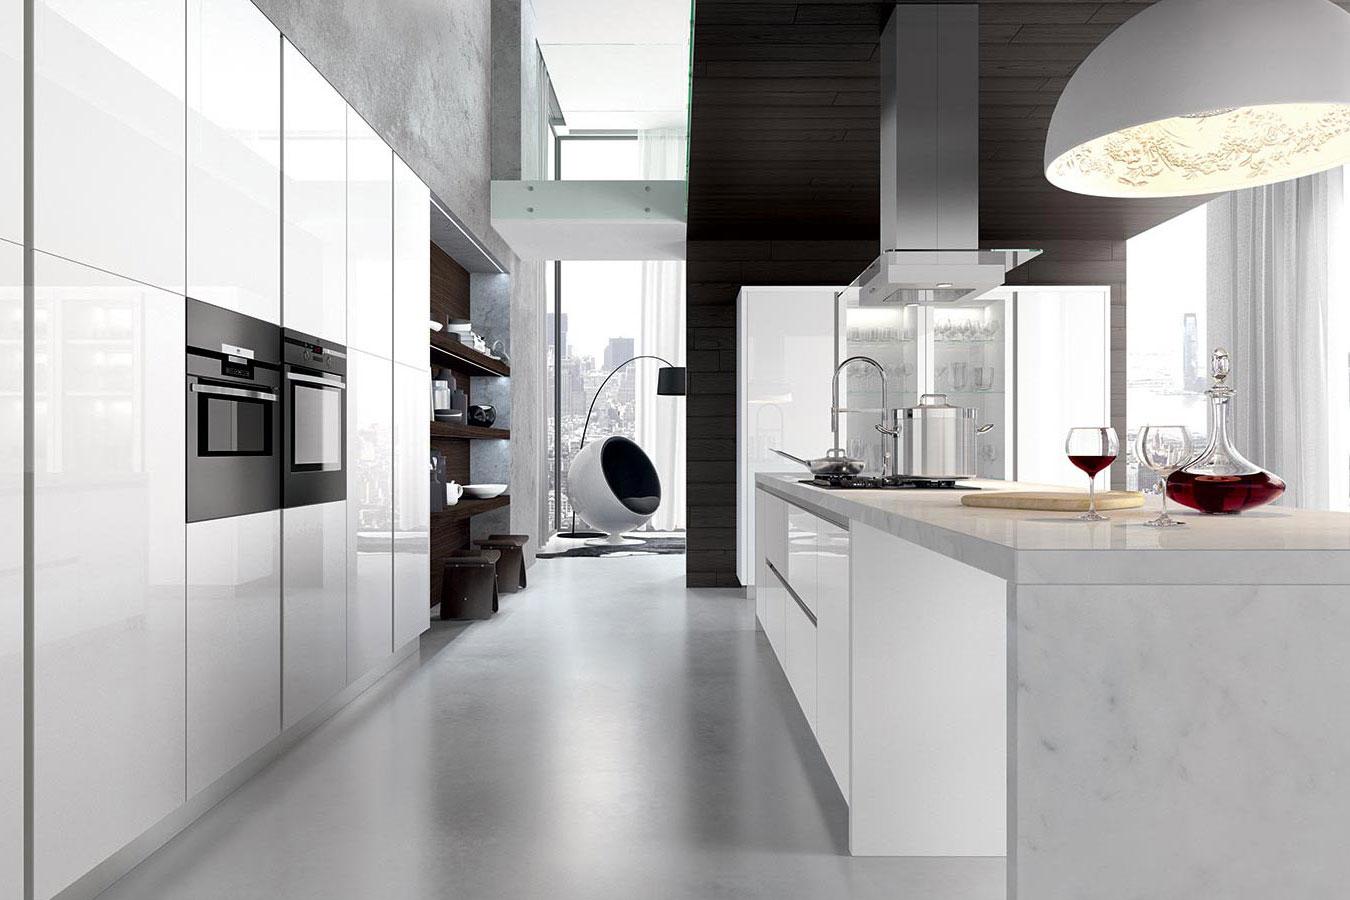 Cucina Glass di Arredo3 da righetti mobili a Novara Piemonte